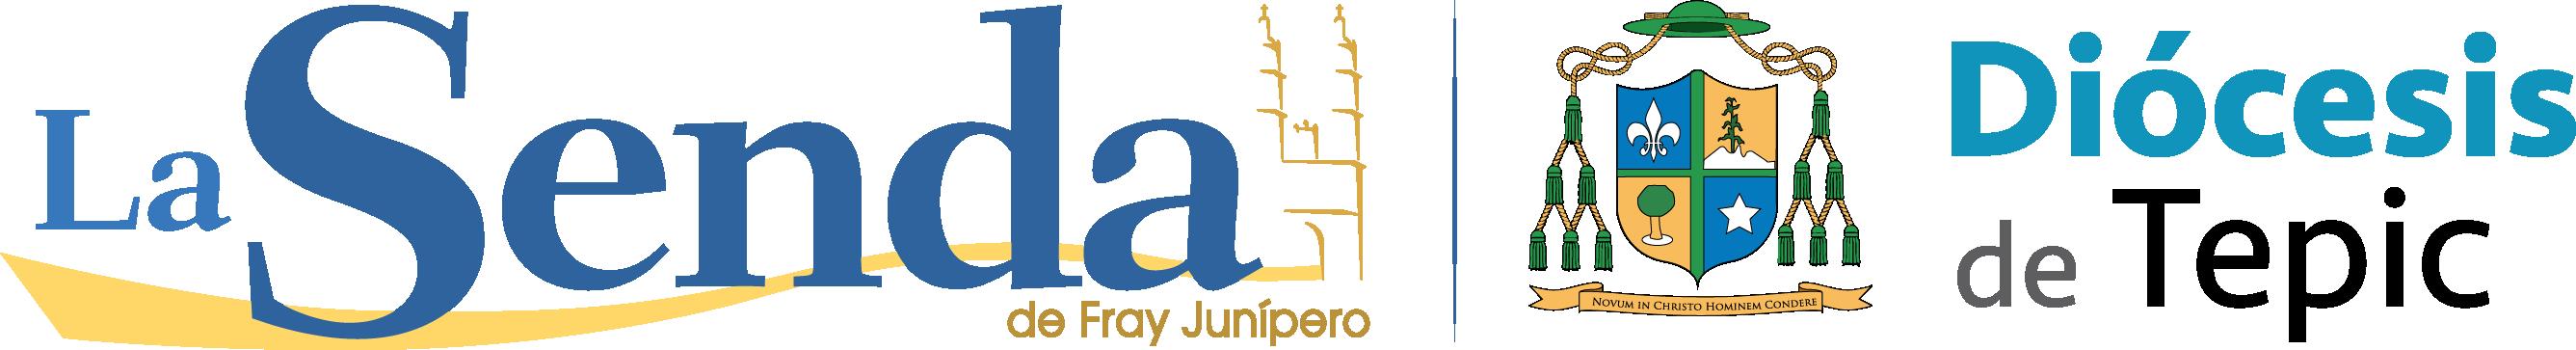 La Senda de Fray Junípero – Revista Católica